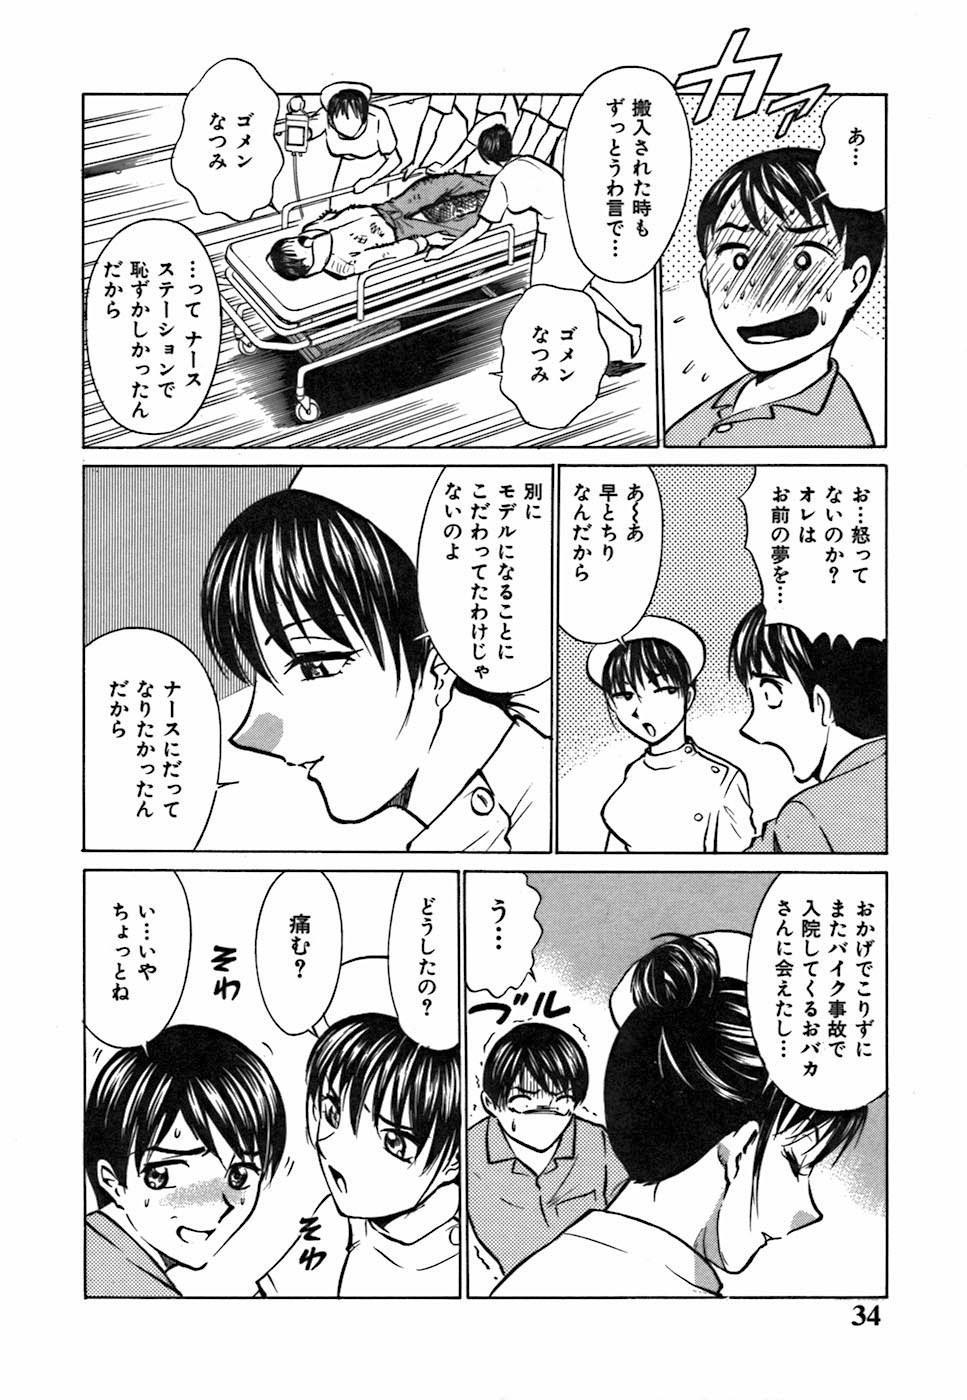 Kimi ga Nozomu Katachi | Appearance for which you hope 33